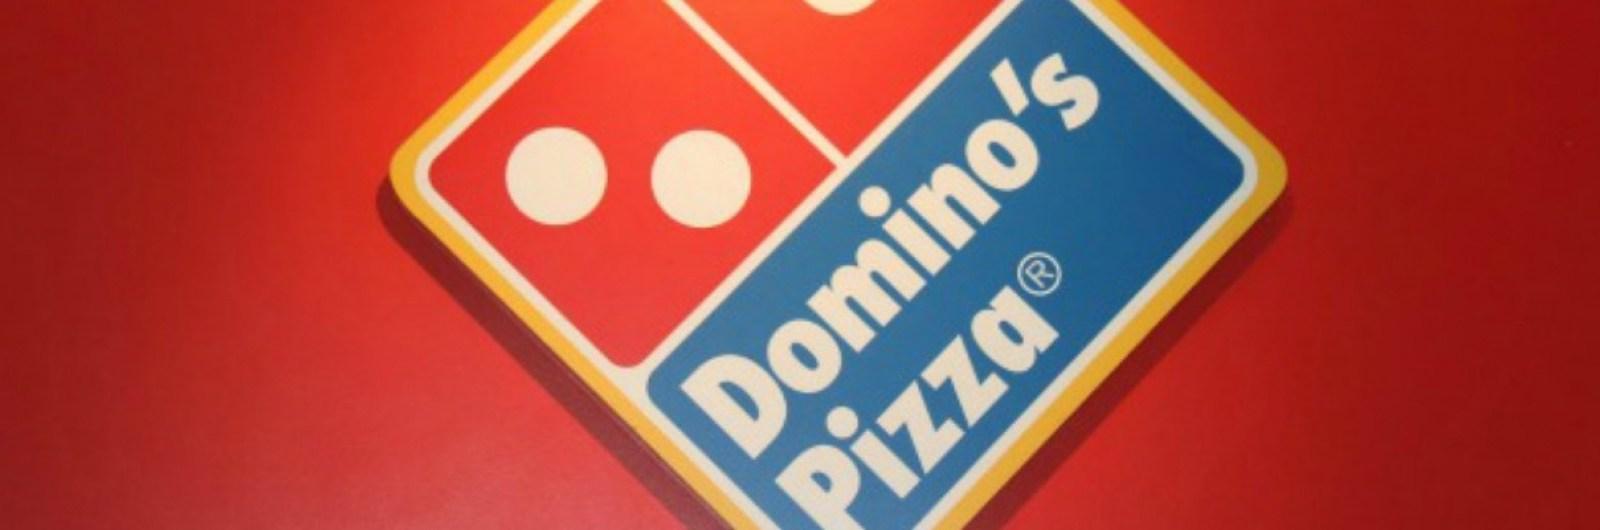 Joint Venture quer expandir Domino's Pizza na Alemanha